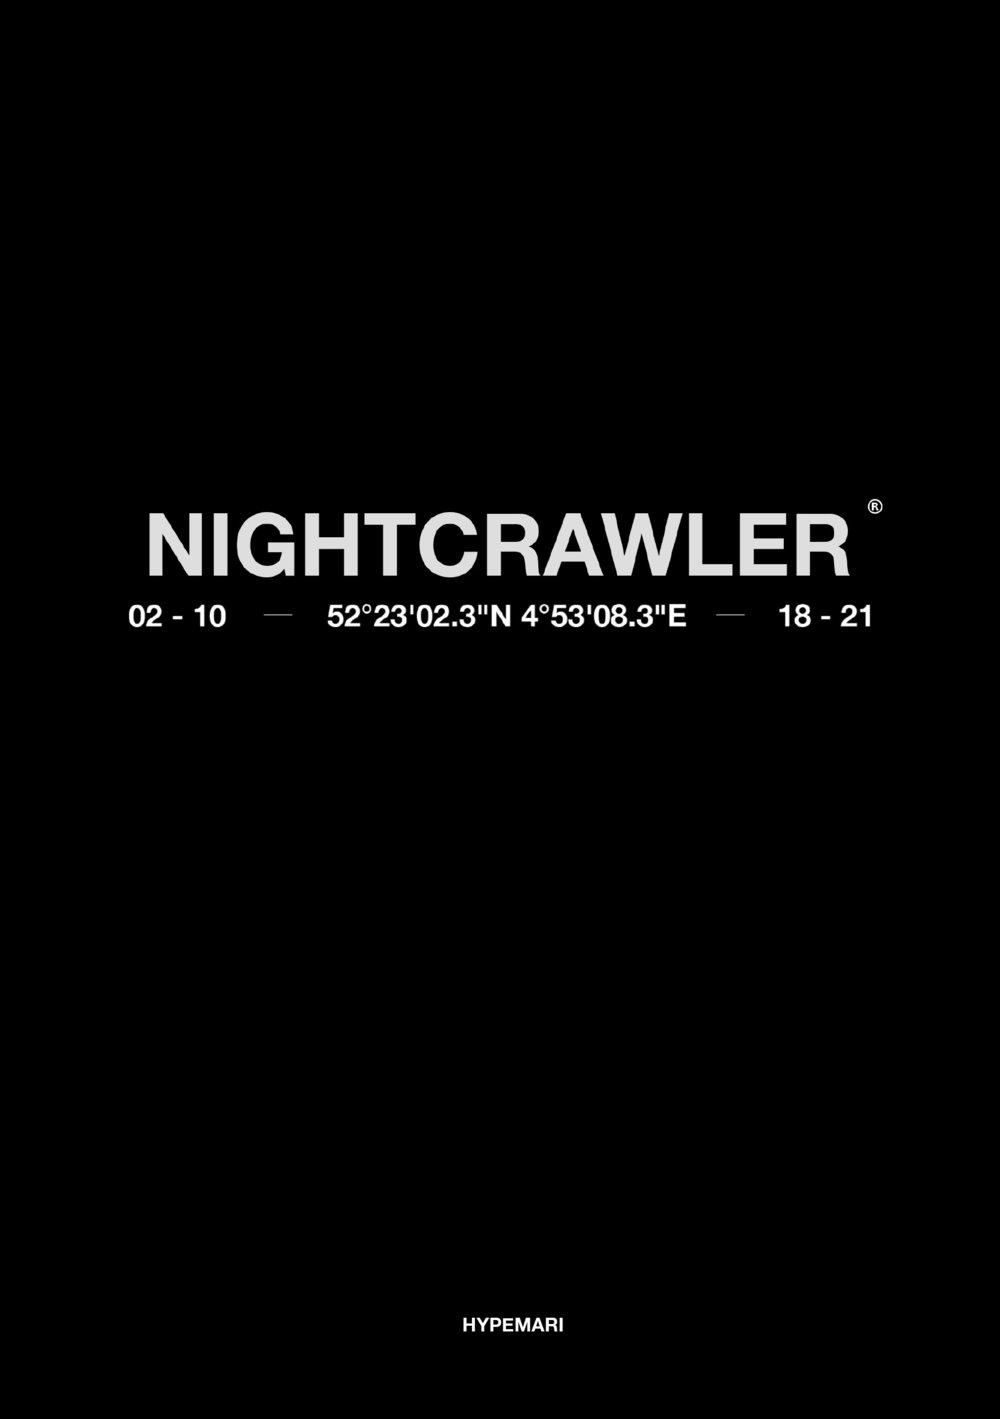 NIGHTCRAWLER ZINE